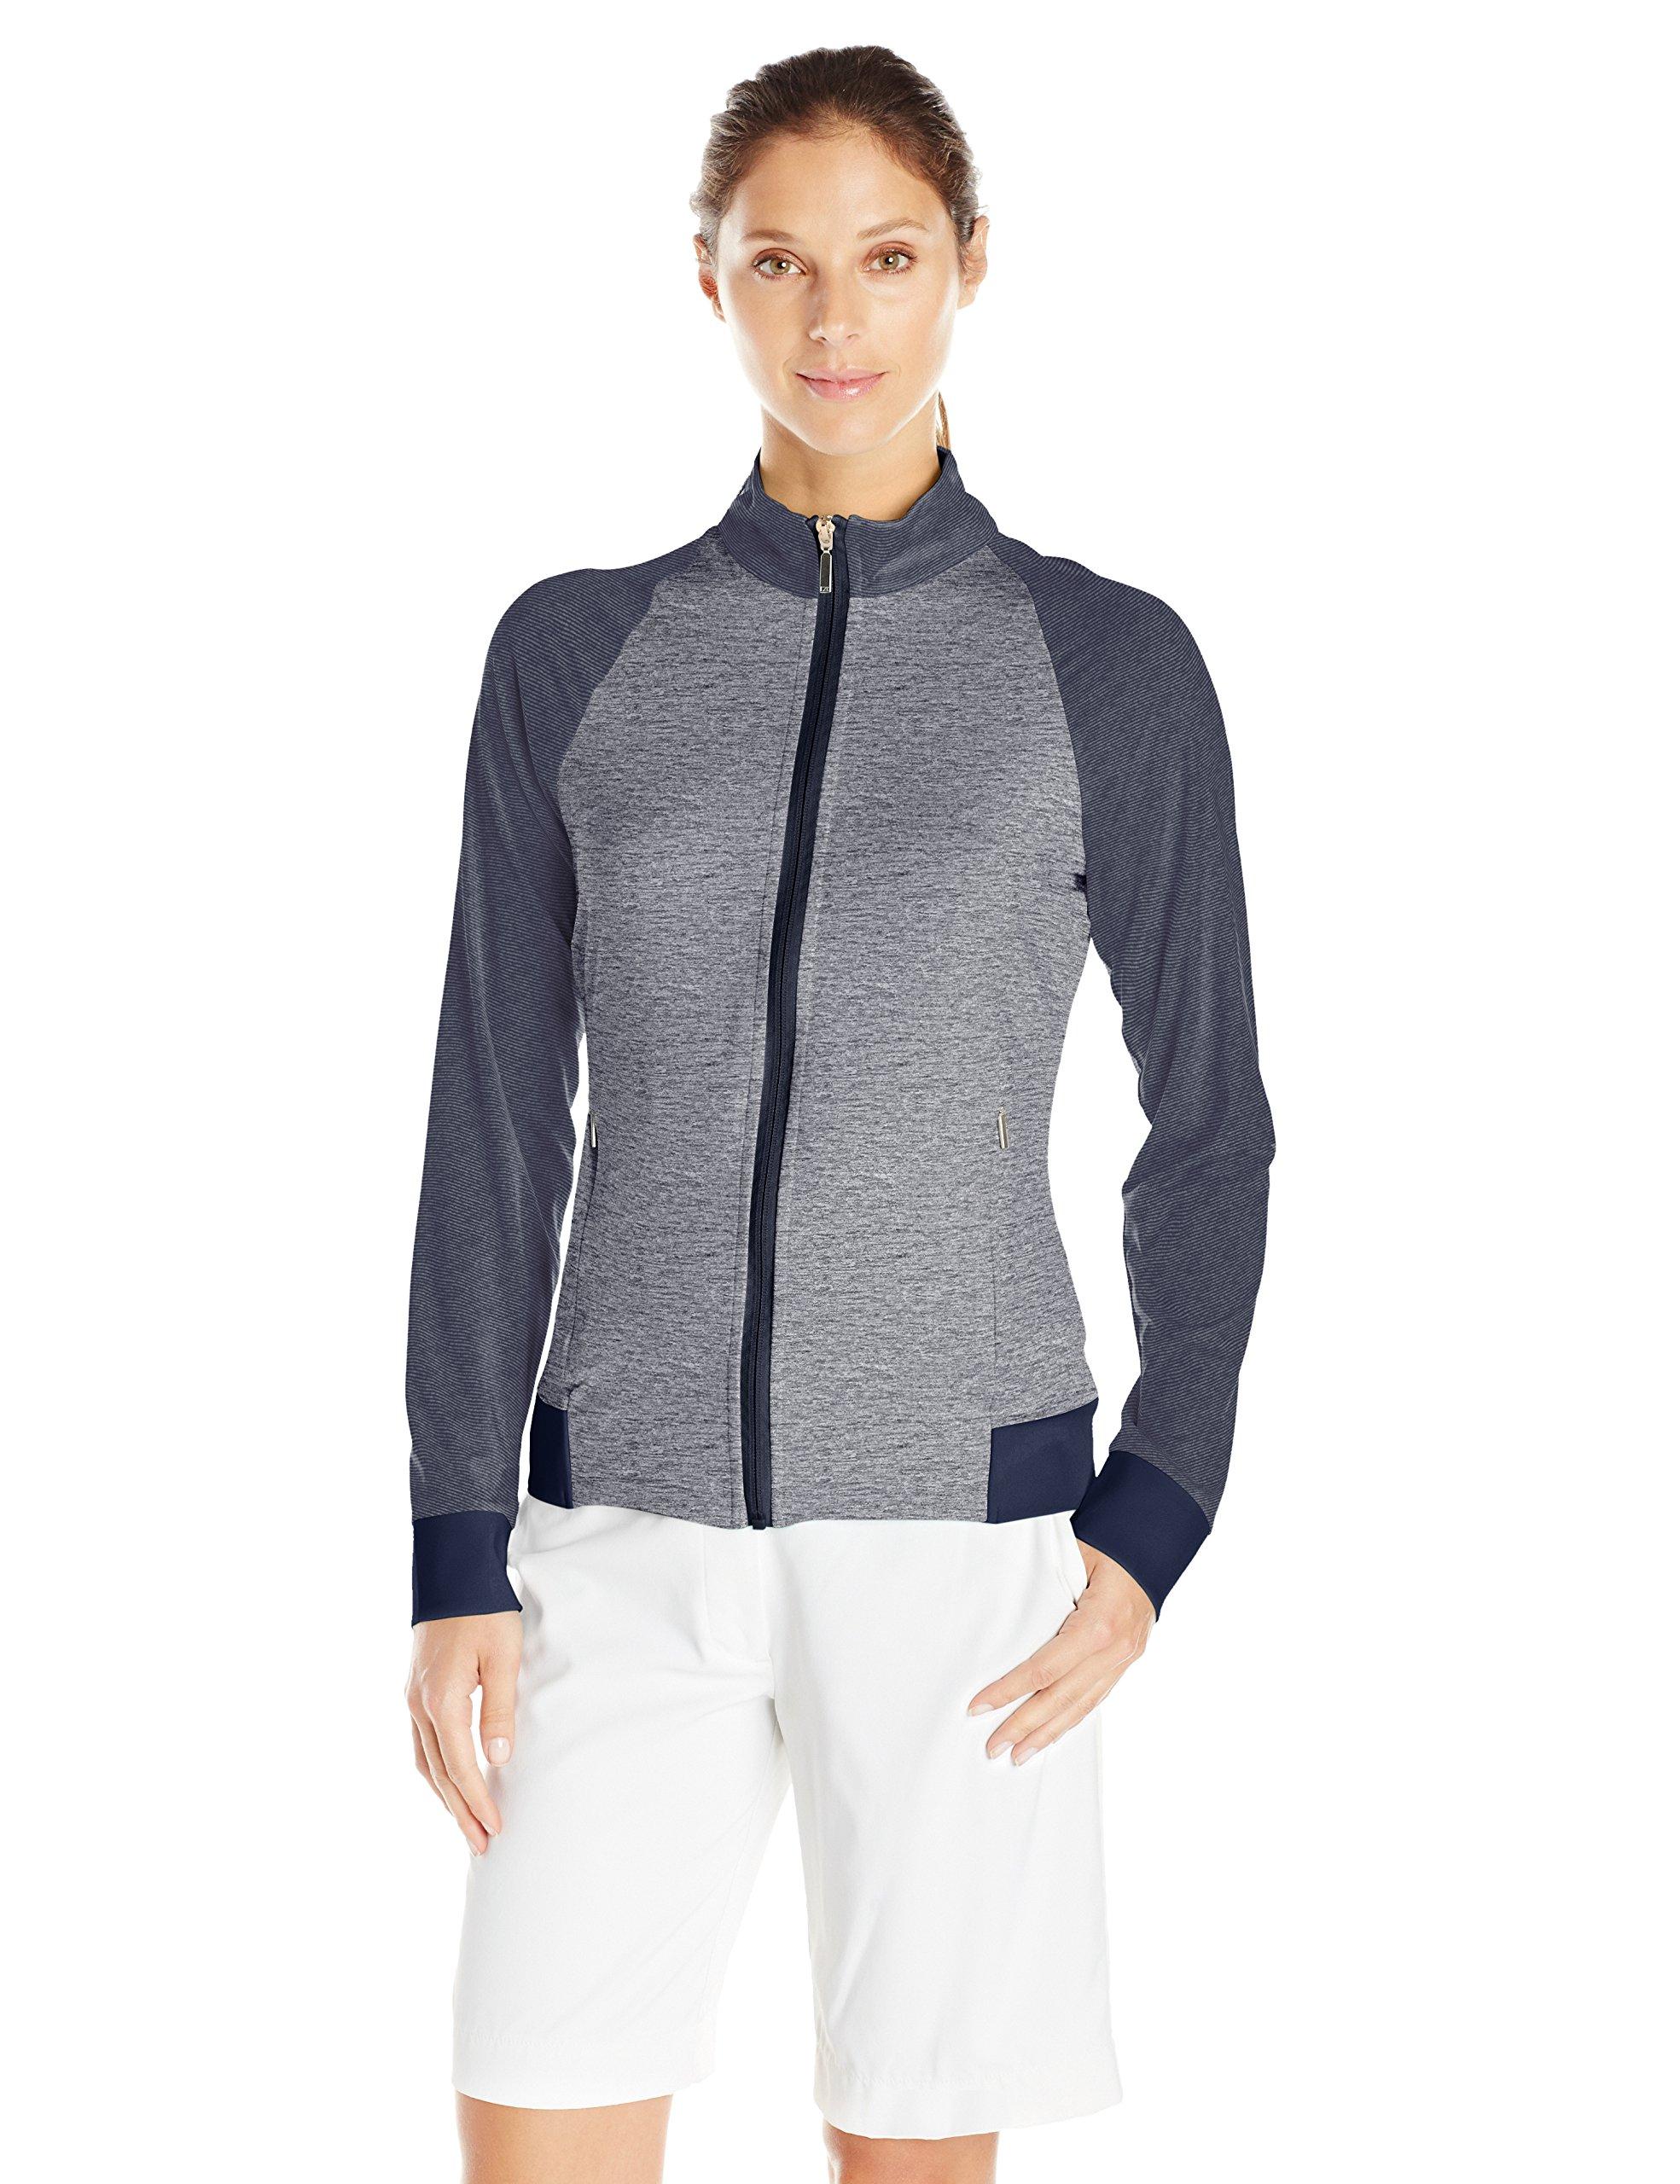 Cutter & Buck Women's Moisture Wicking, UPF 50+, Long-Sleeve Lena Full Zip Jacket, Liberty Navy, XS